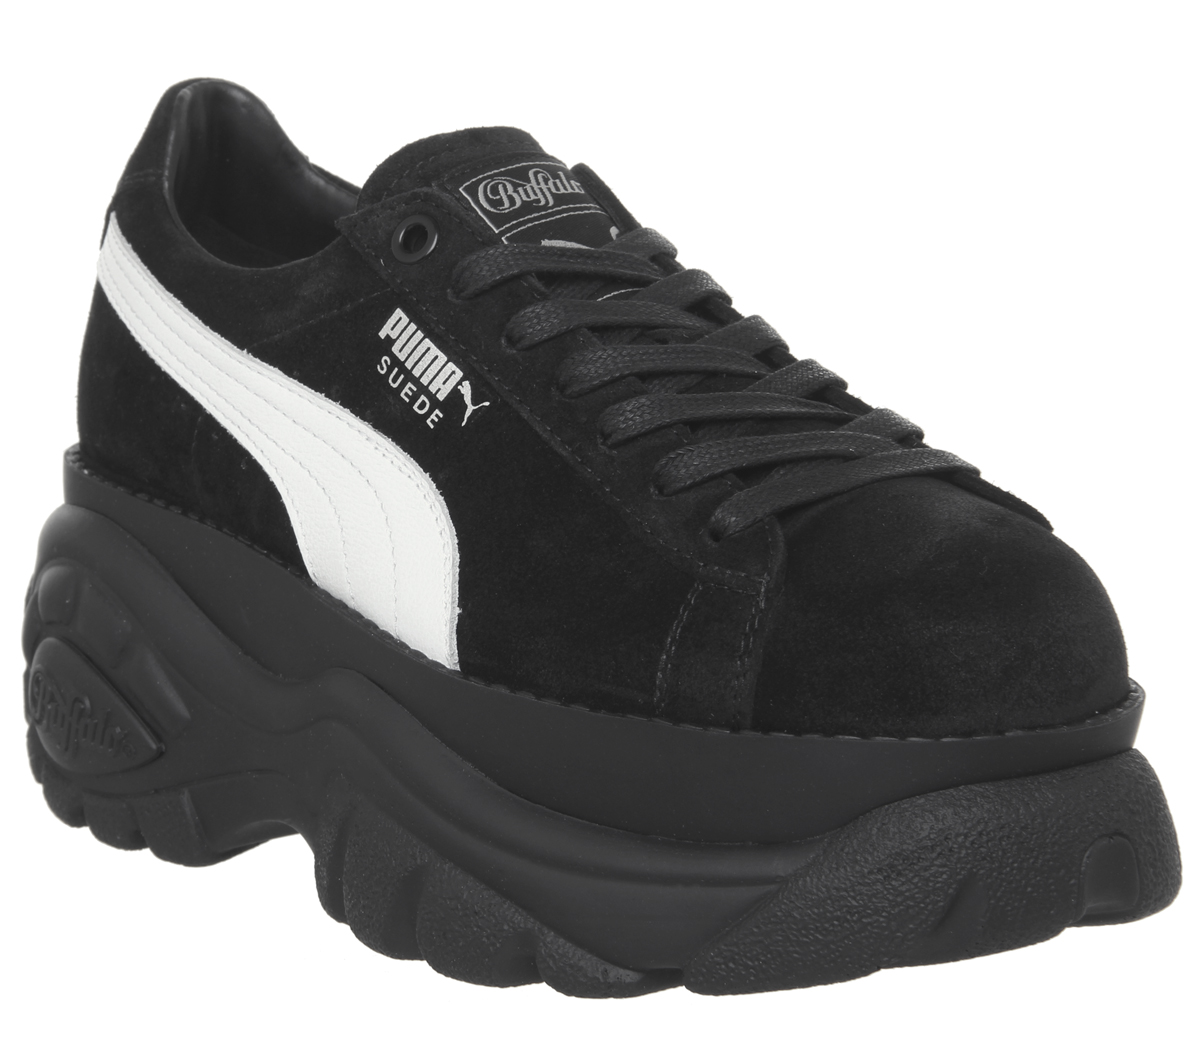 cheap for discount a3b04 a47c4 SENTINELLE Womens Puma Suede Buffalo formateurs Puma noir chaussures  formateurs